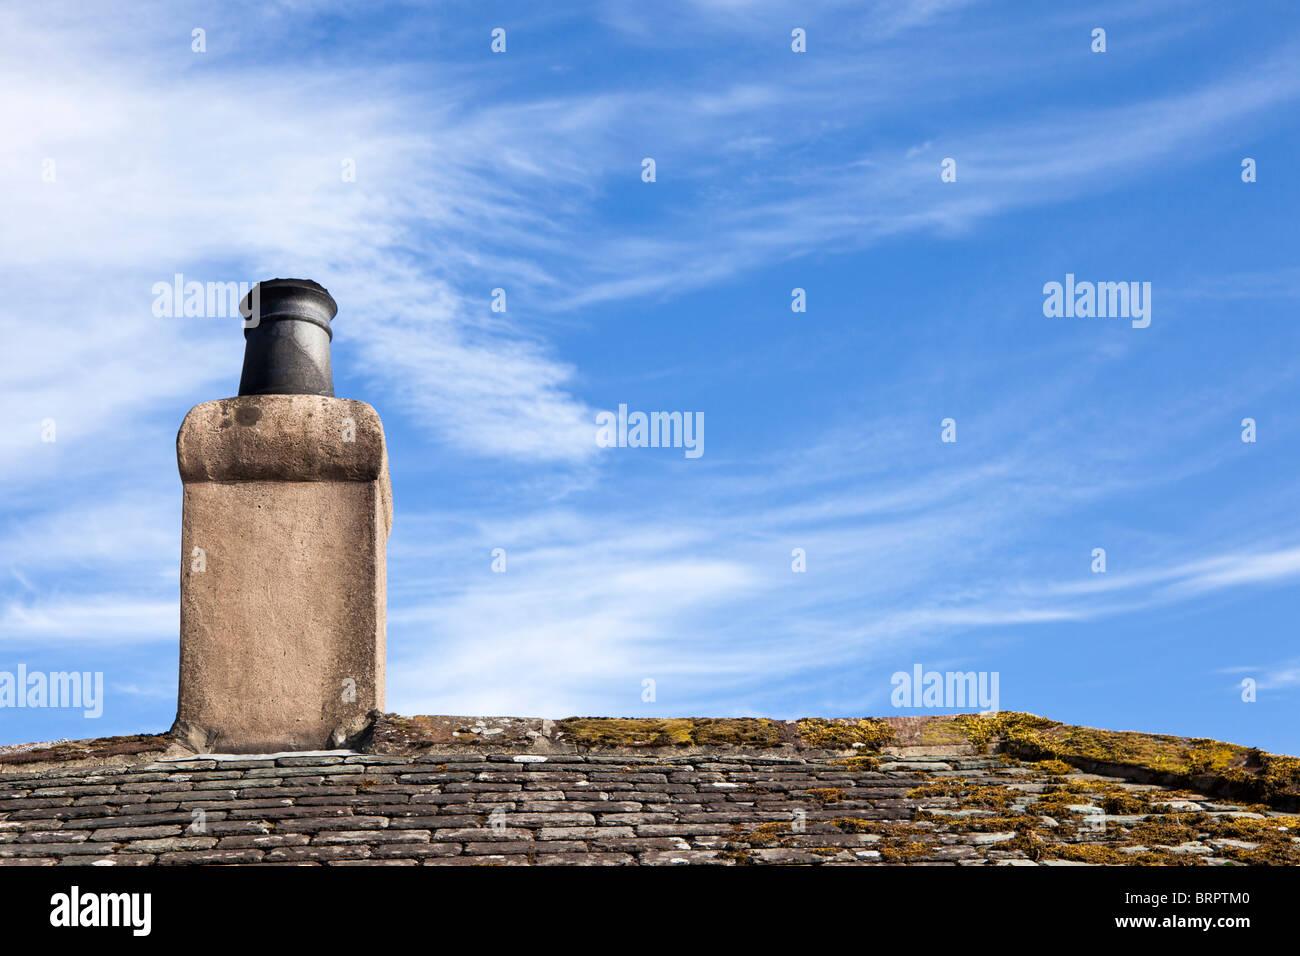 Old rendered chimney pot stack on a slate roof UK - Stock Image